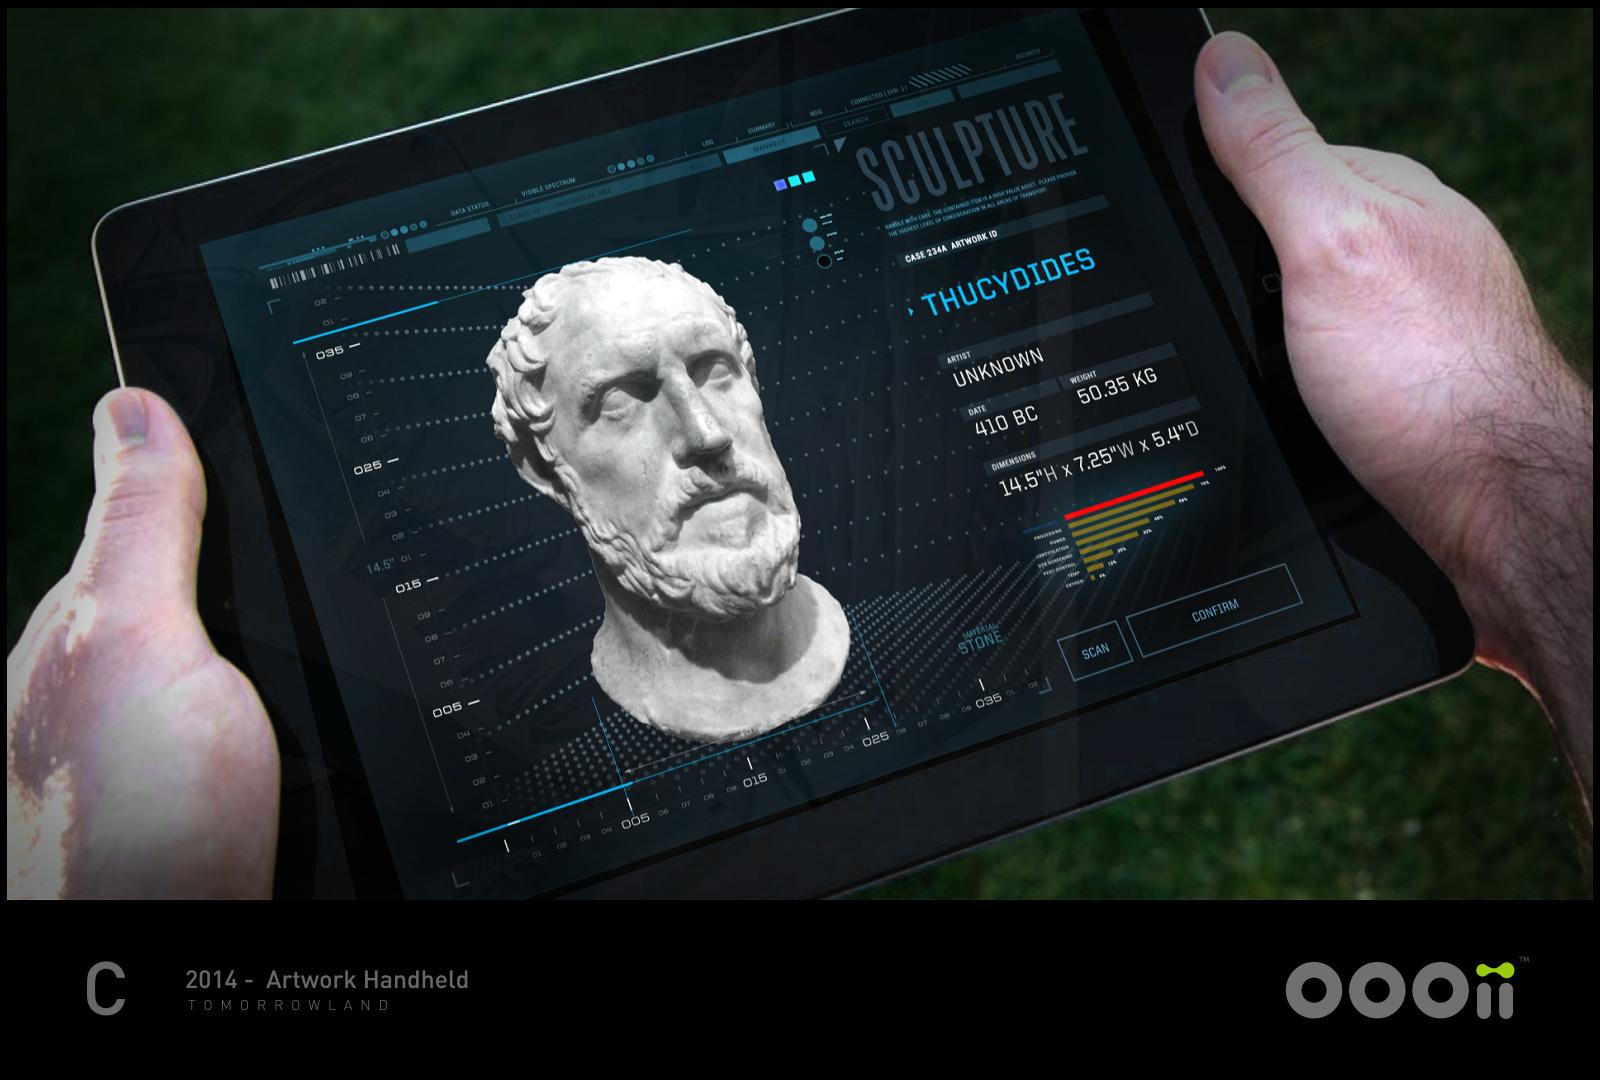 TL_2014_Art_Handheld_Device_C_iPad_Preview_131124_v2.jpg